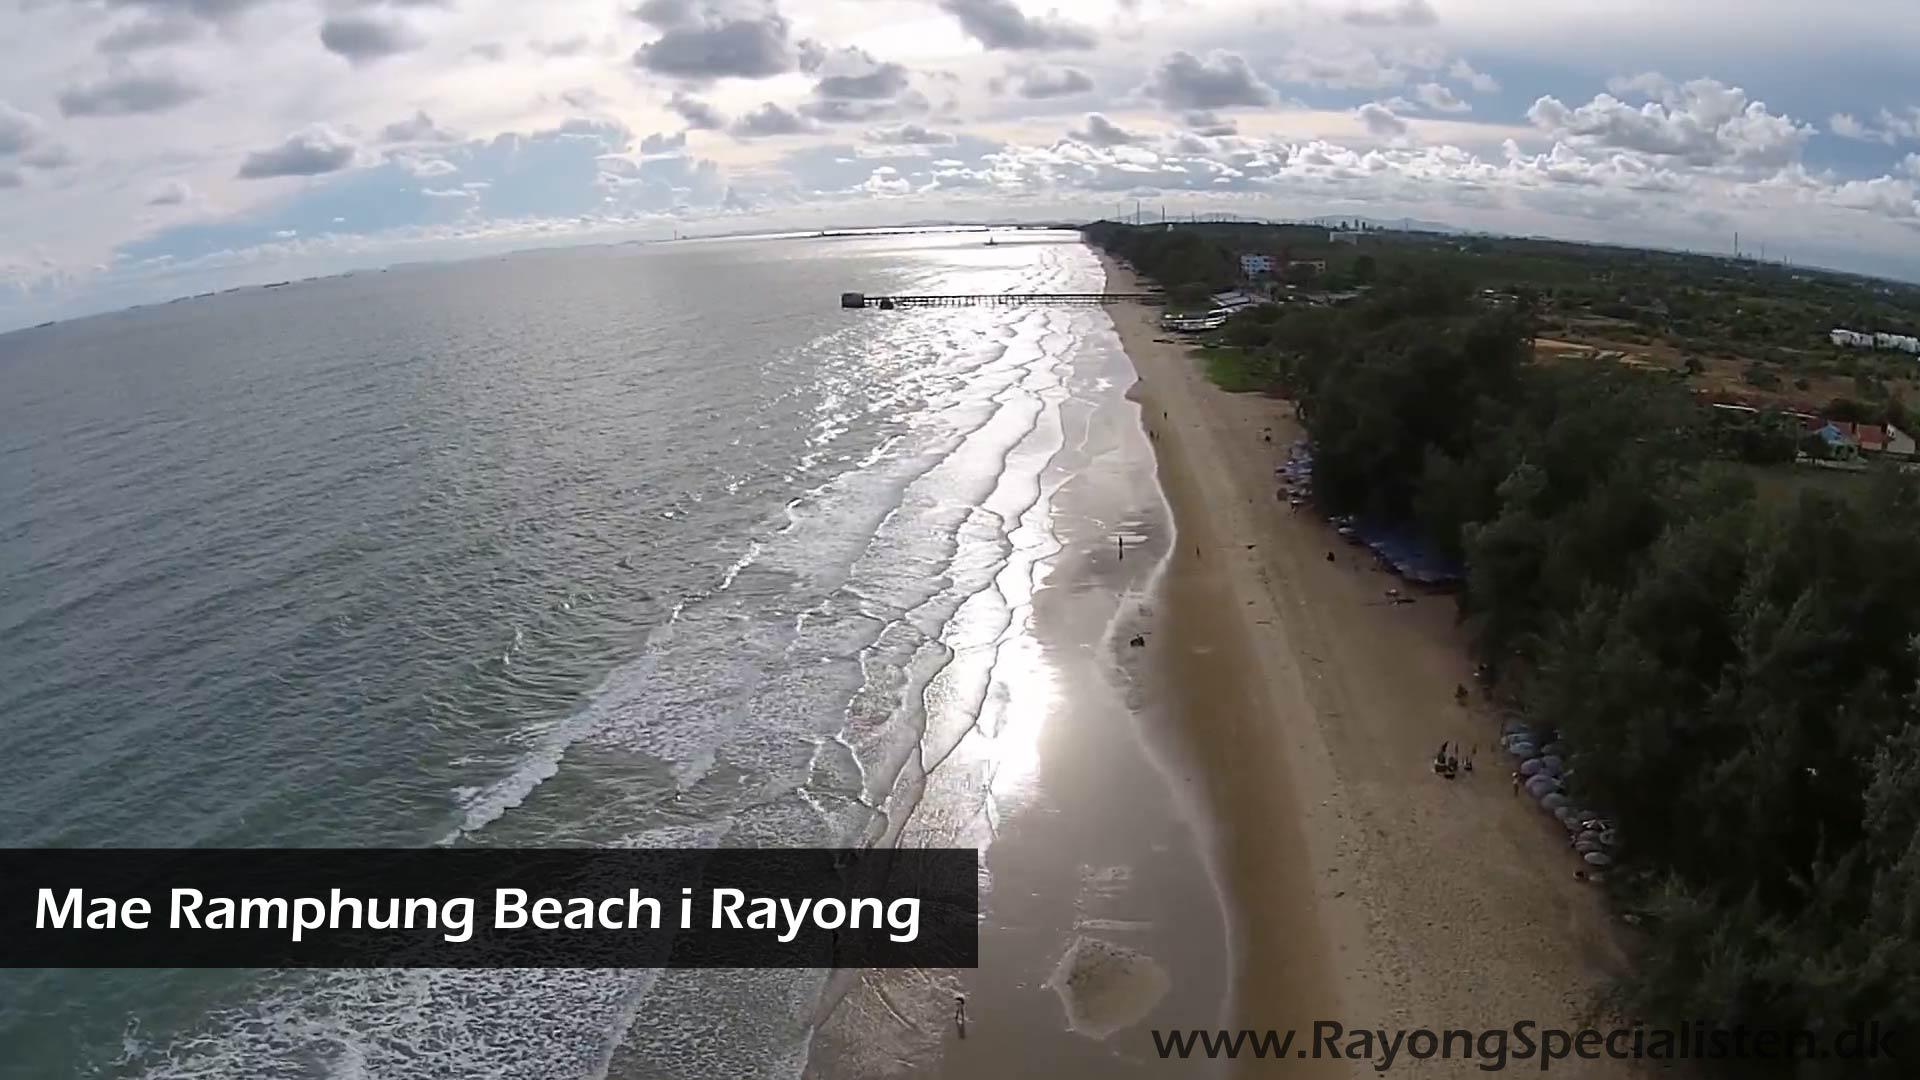 Mae Ramphung Beach fra luften i Rayong